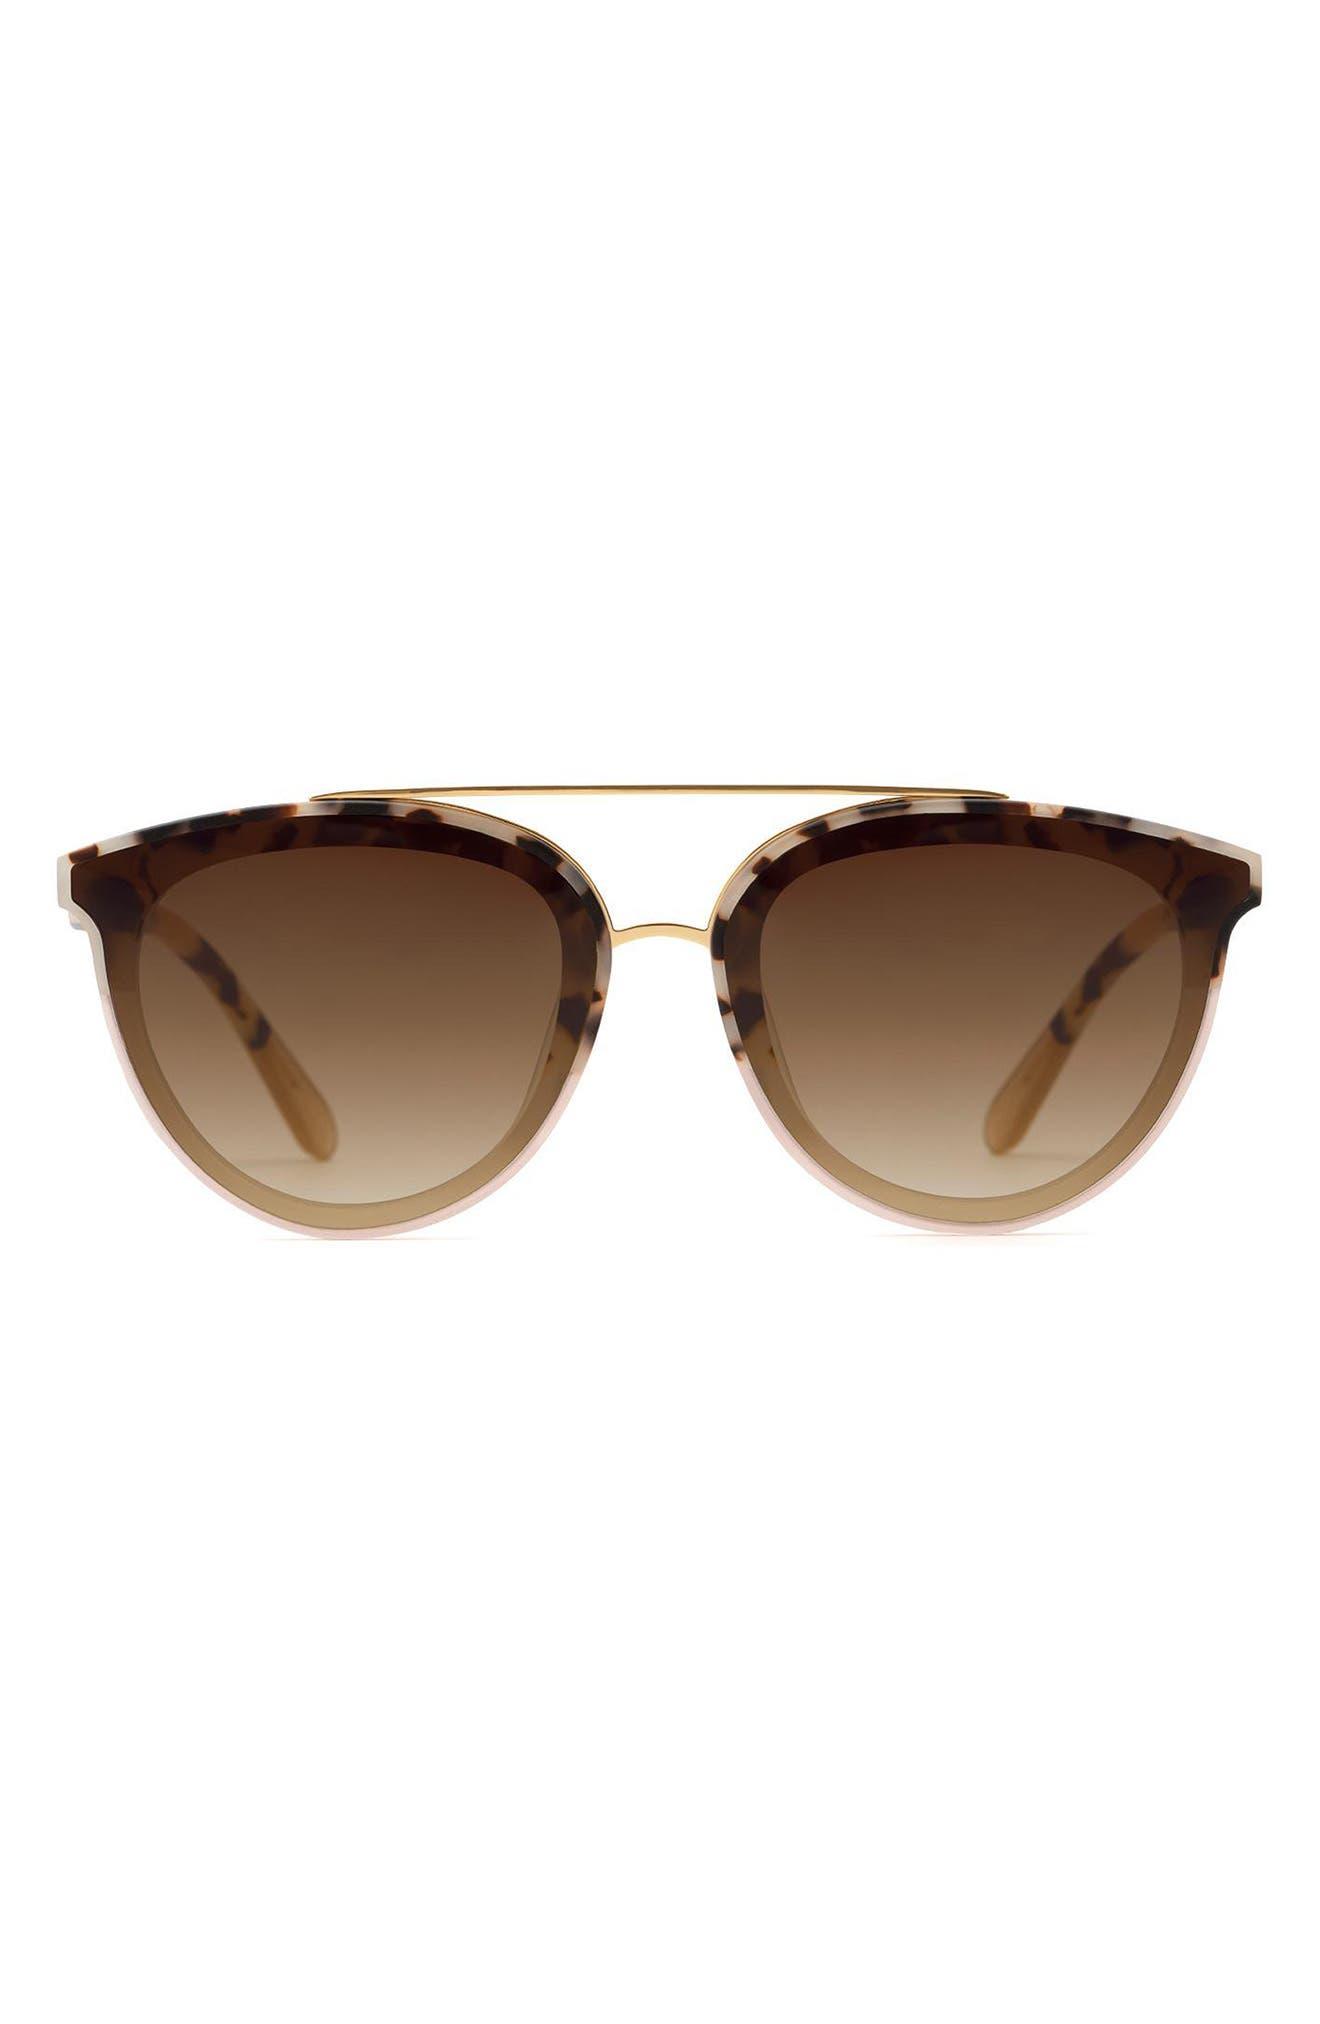 Clio 63mm Gradient Oversize Cat Eye Sunglasses